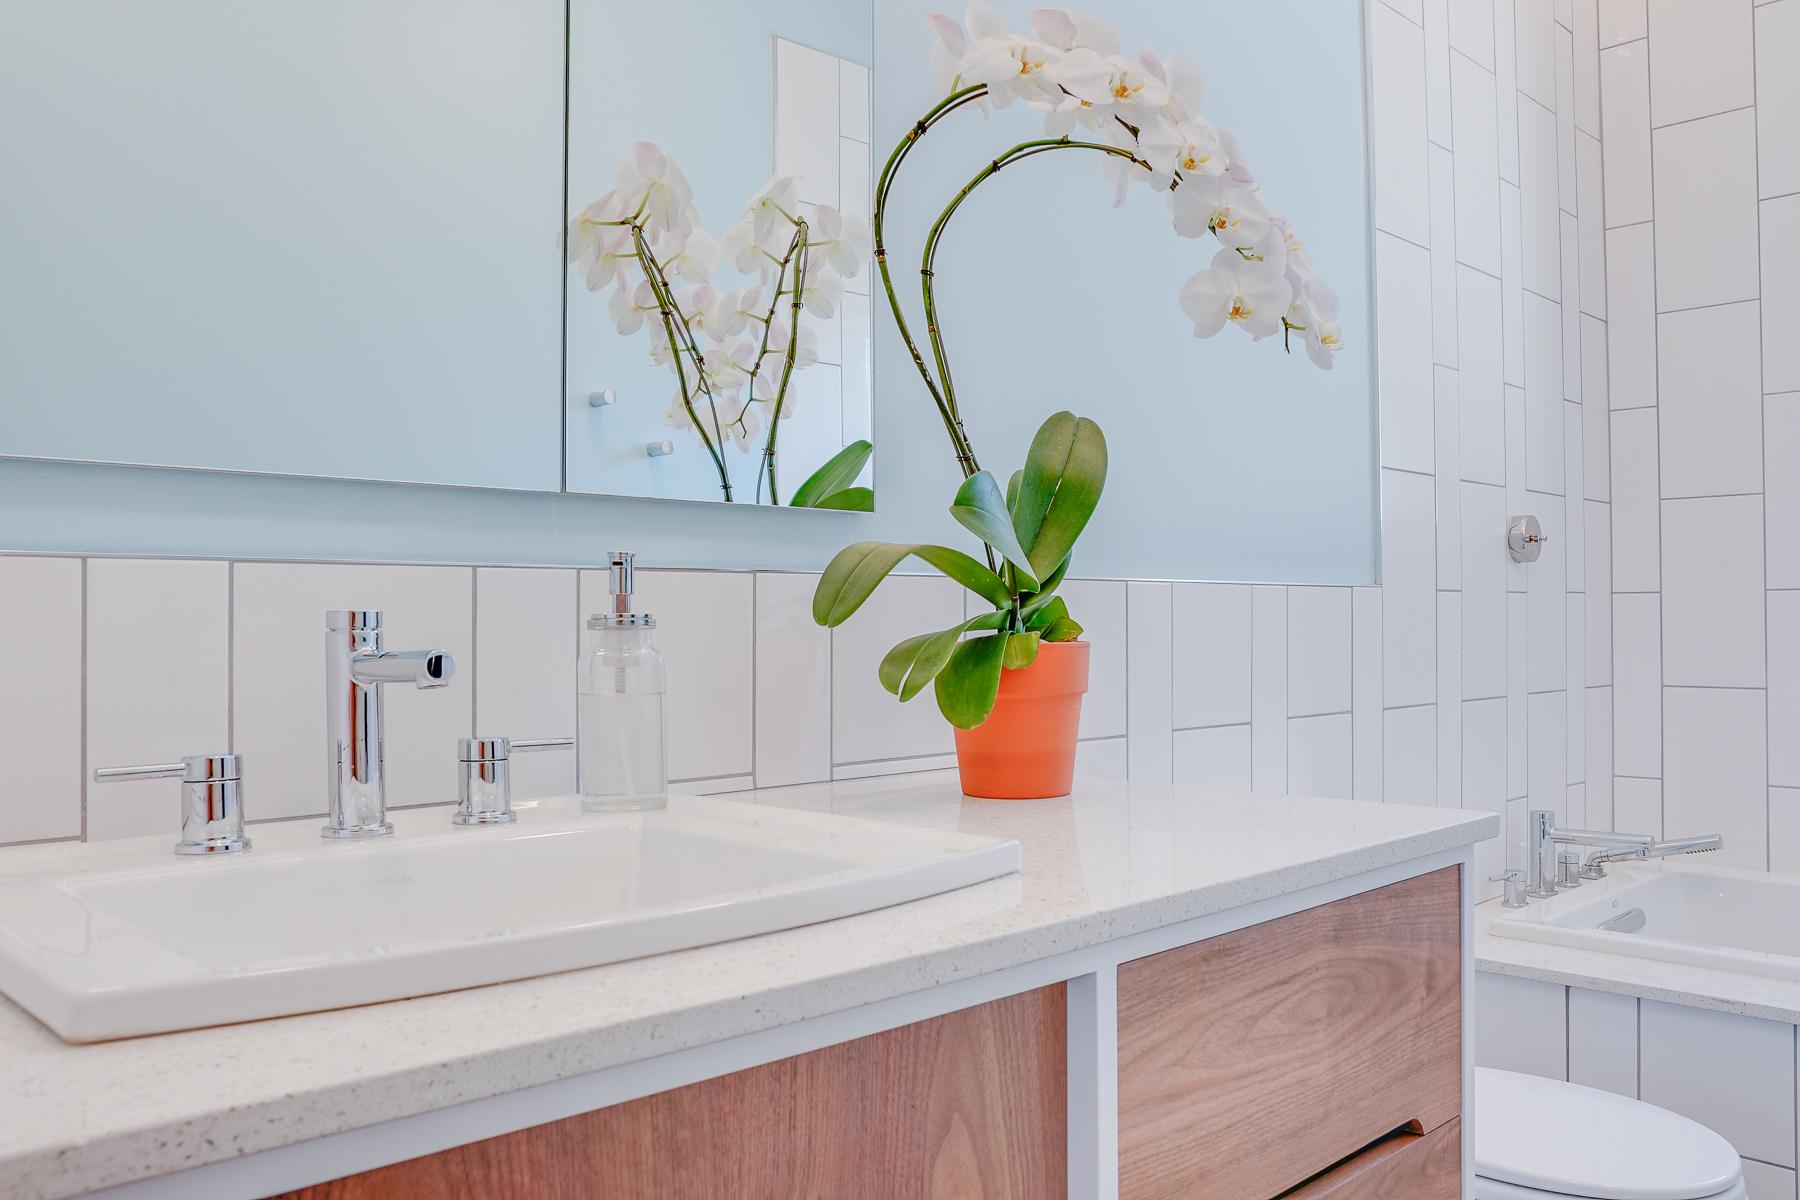 Kovalsky Bathroom Remodel - Fondare Finish Construction